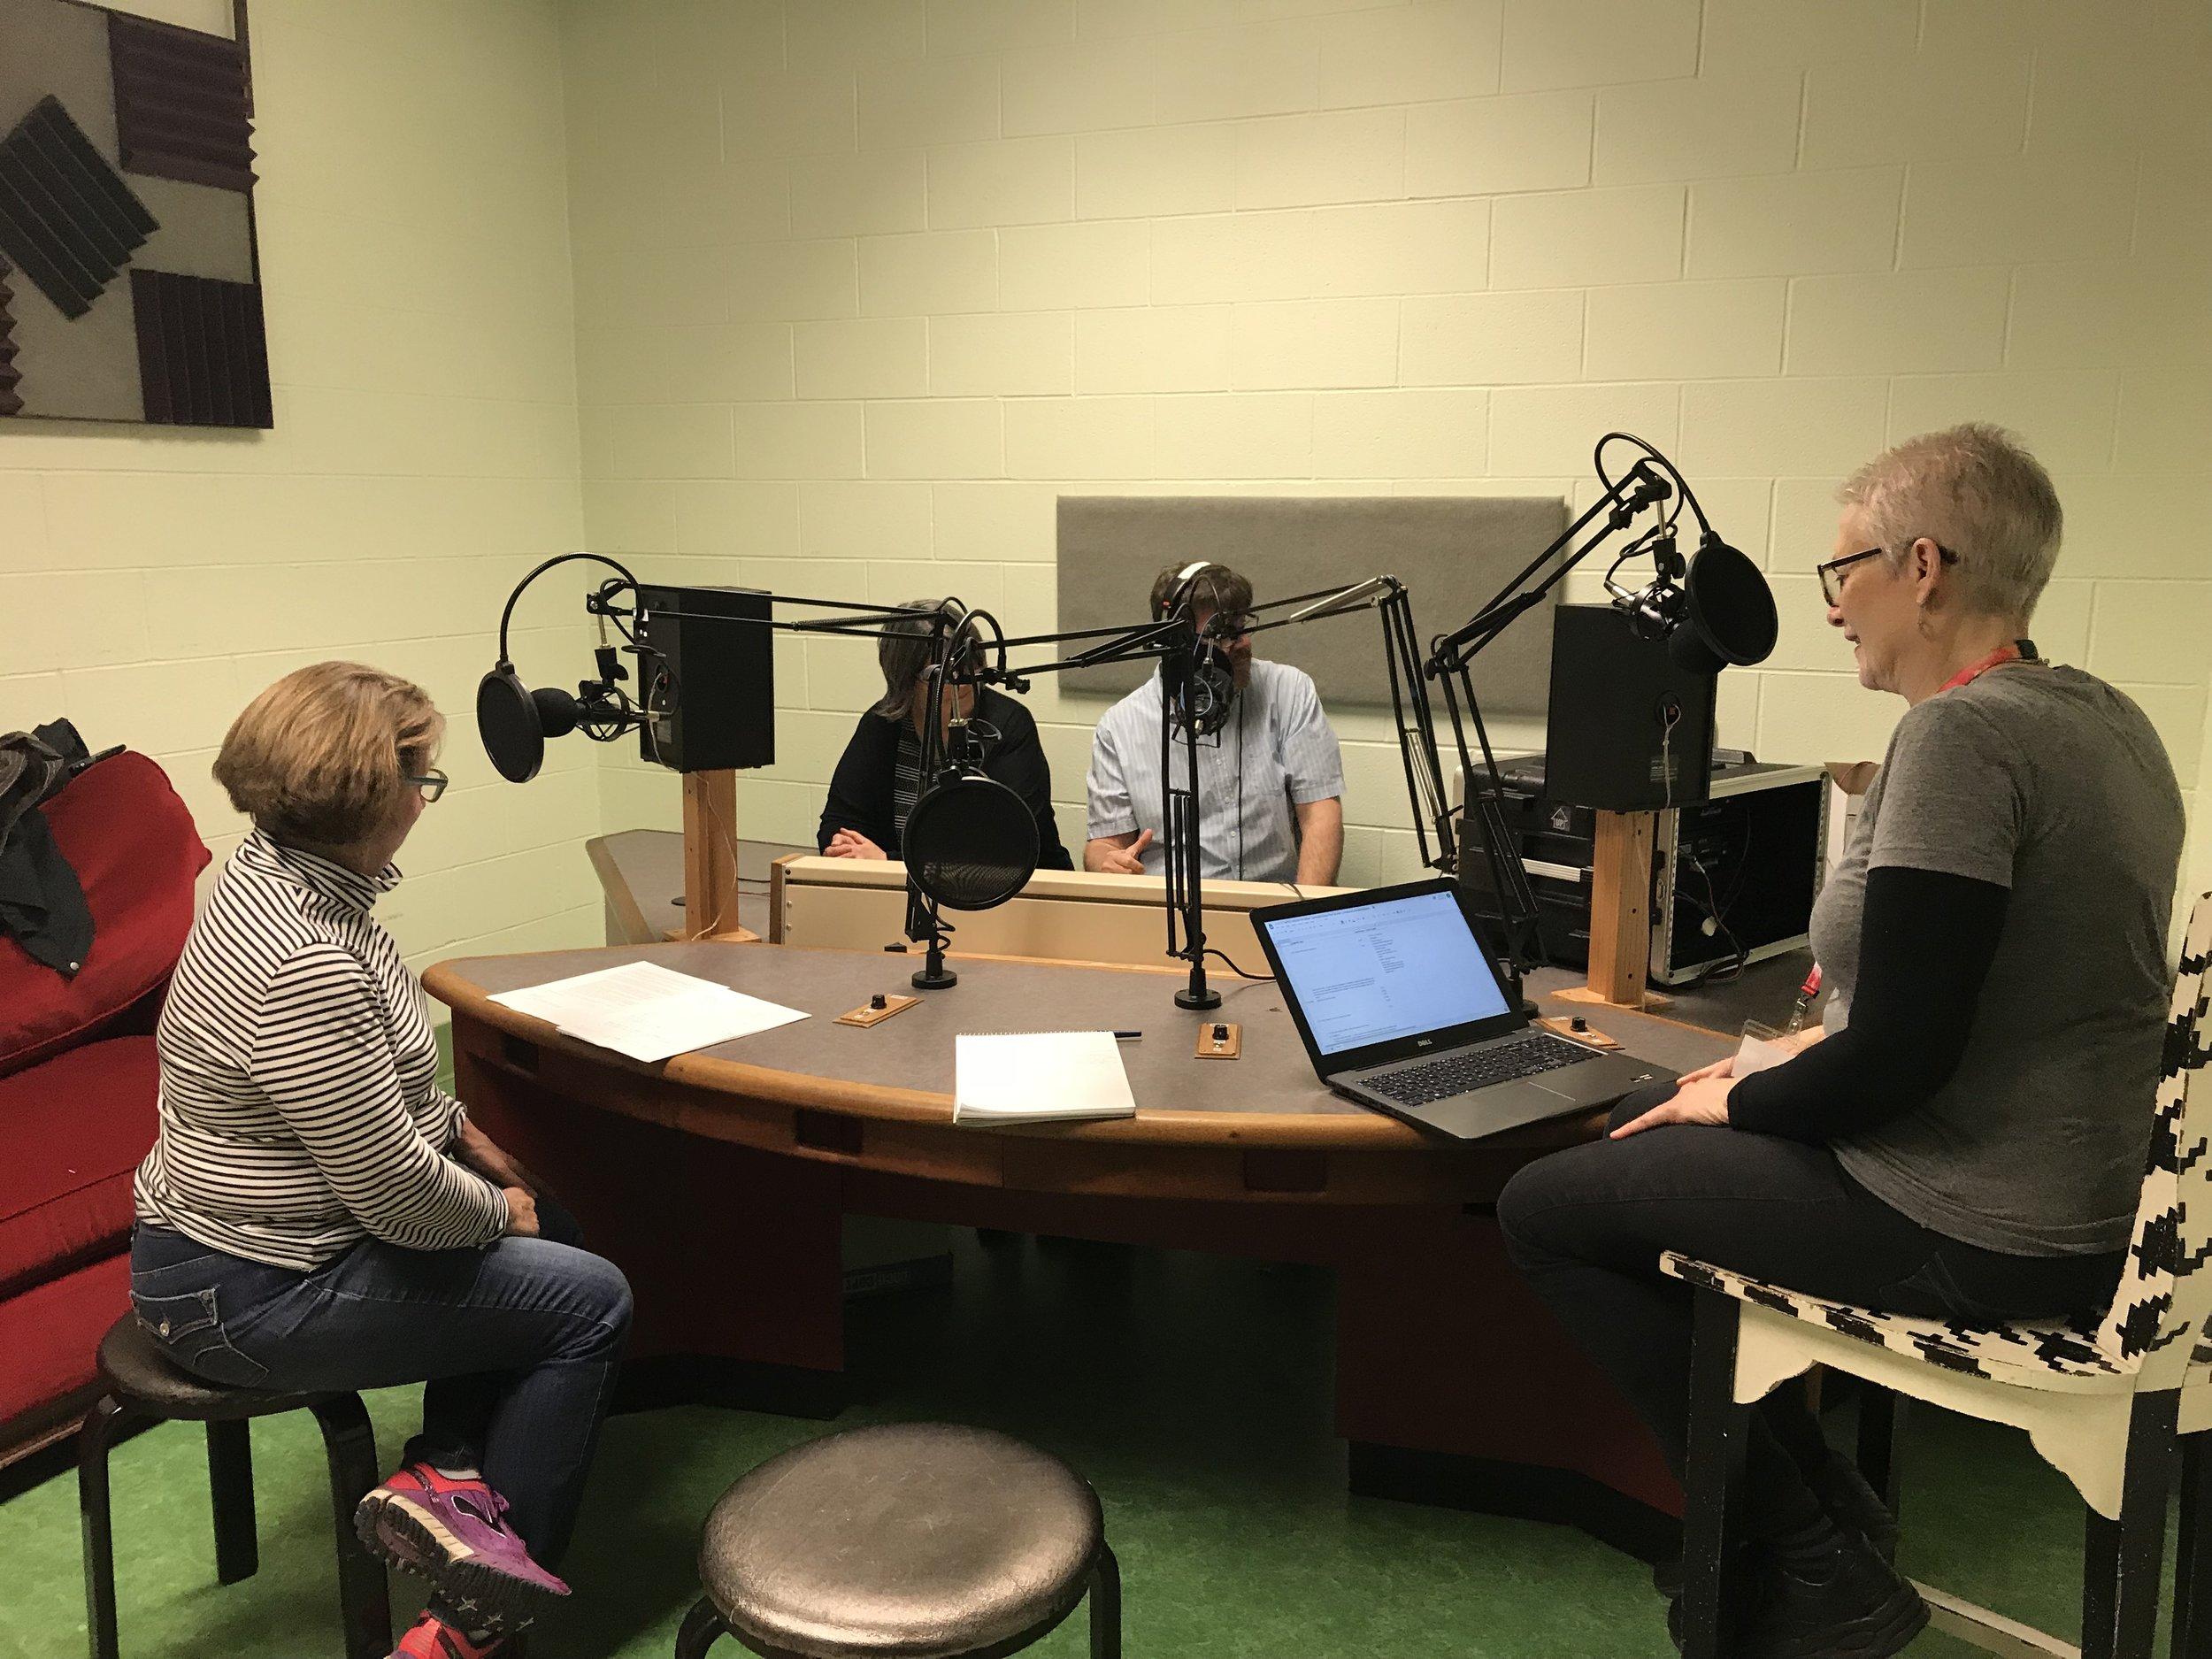 In the Lexington Community Radio studio at the Lyric Theater: from left, Lee Ann Jones, Ouita Michel, Chri Michel, Rona Roberts. Photo credit: Lisa Munniksma